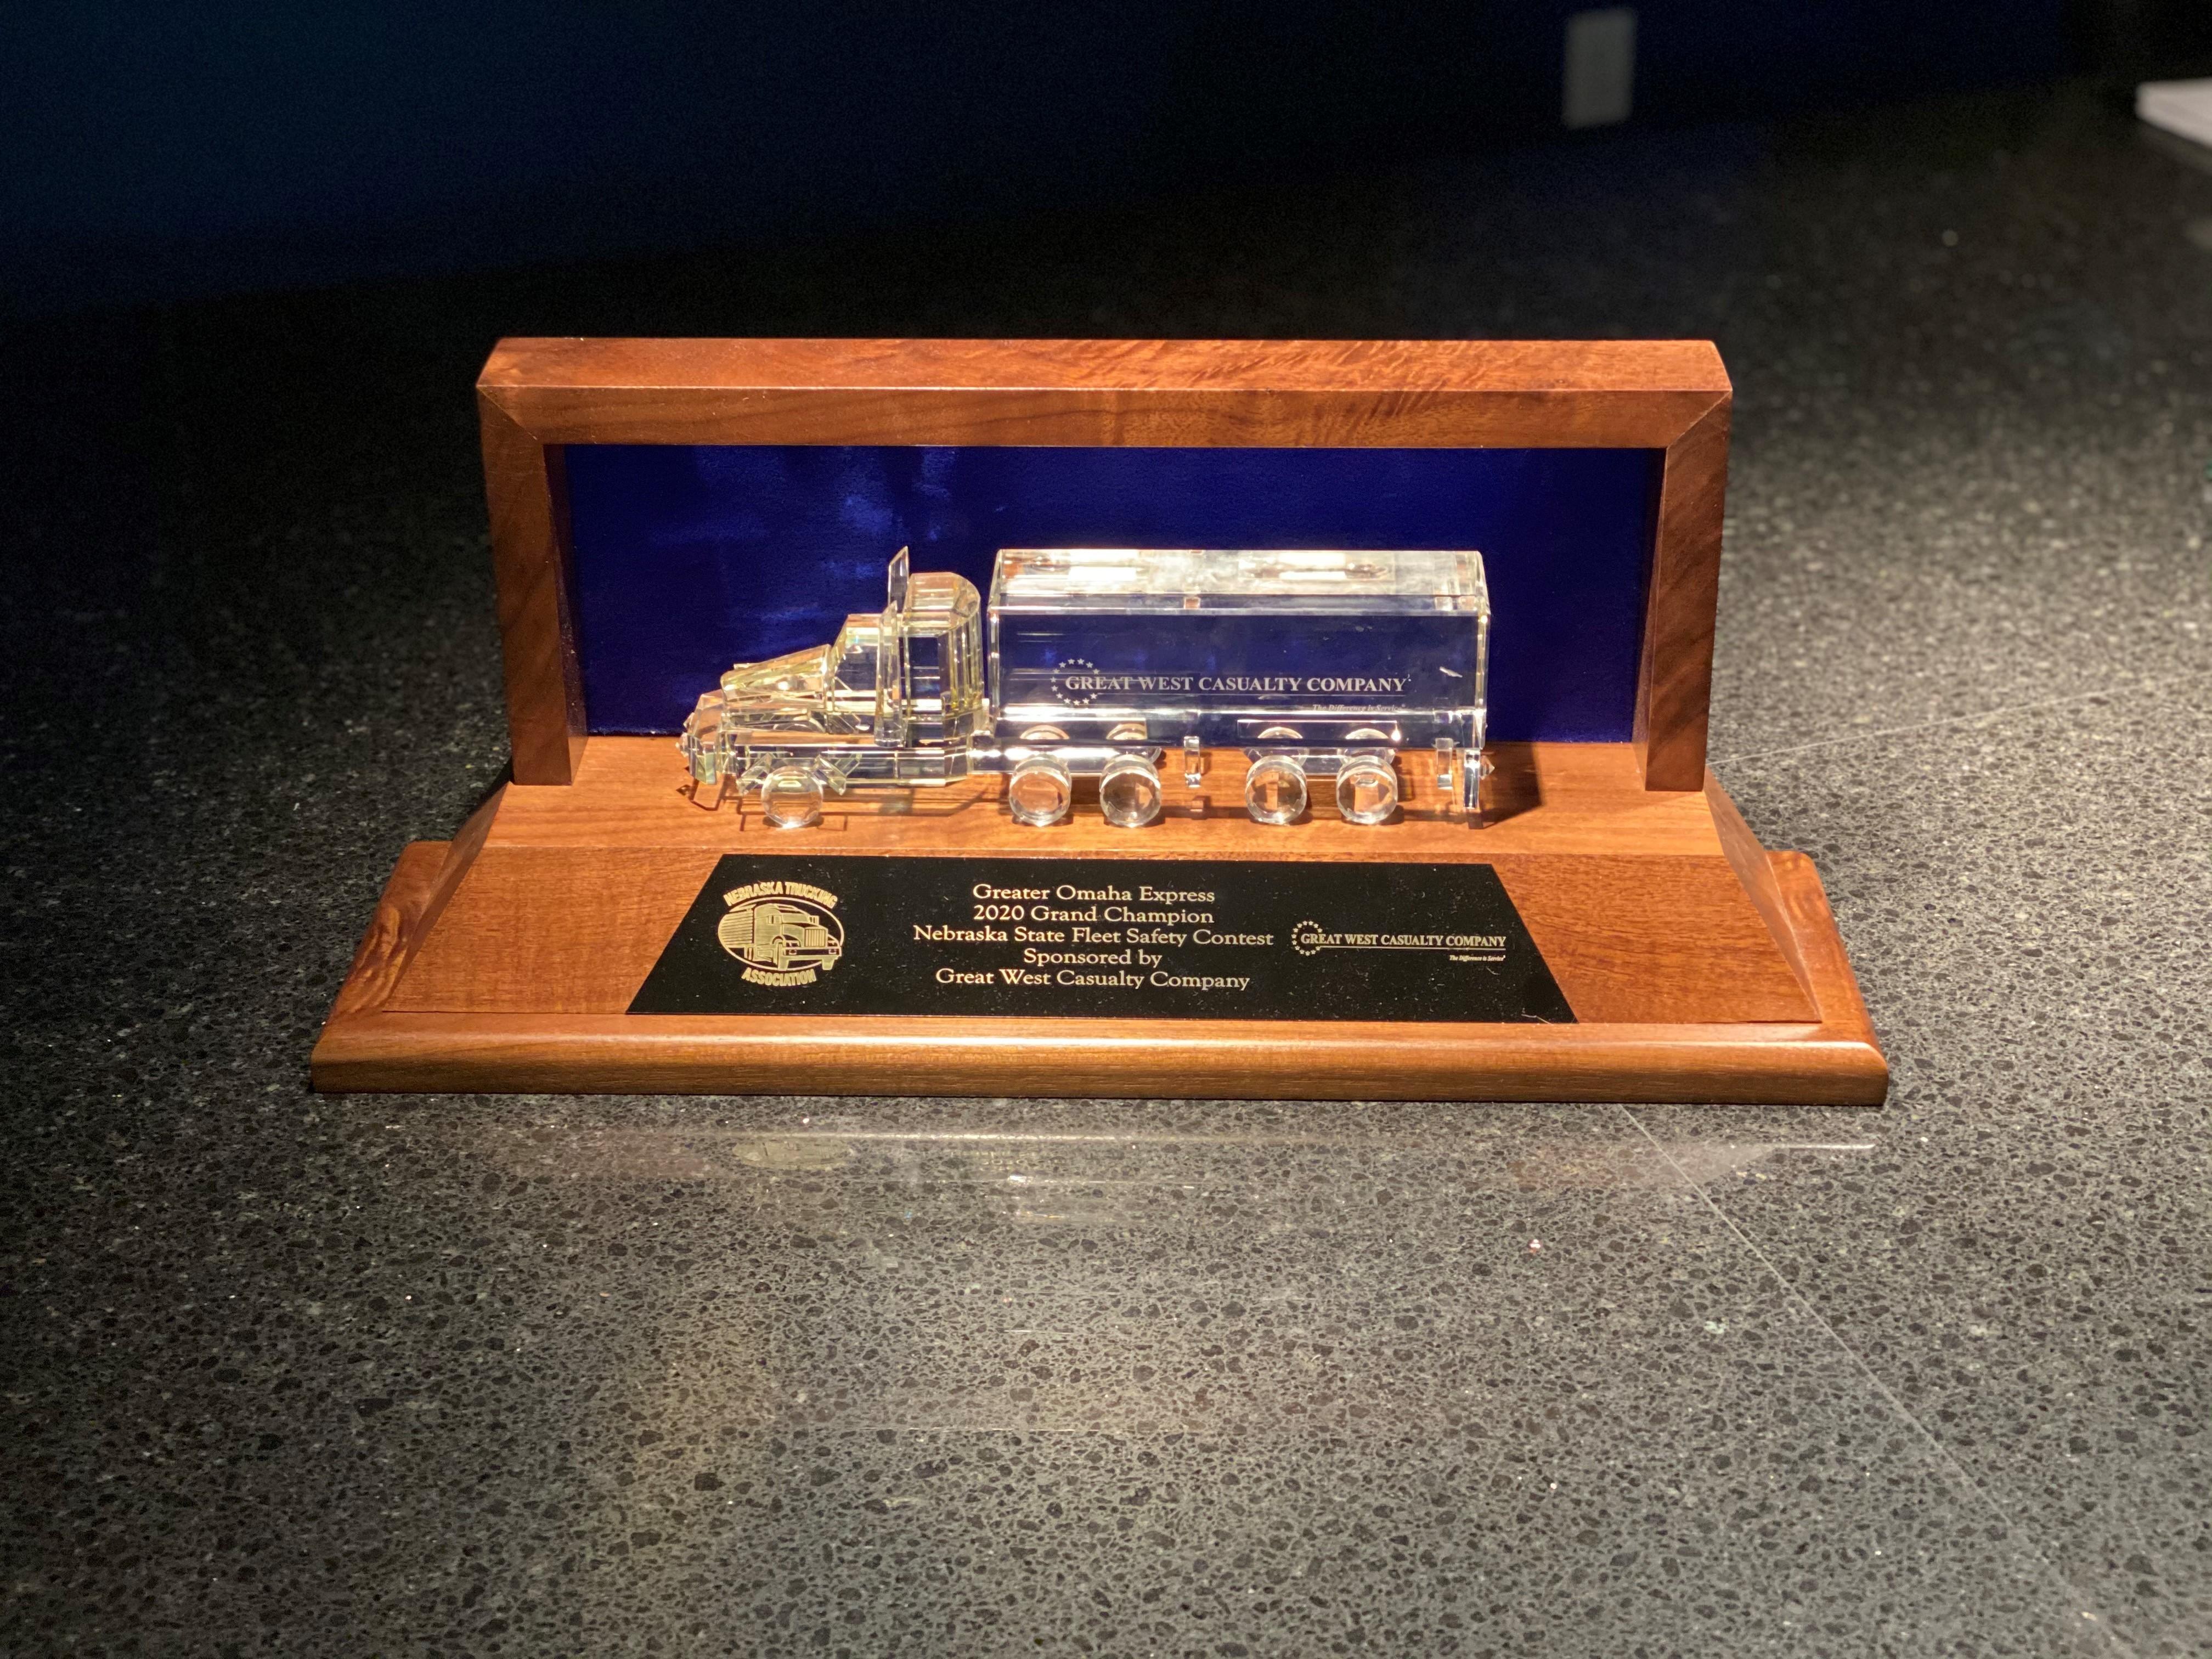 2020 GrandChamp Trophy Pic 4